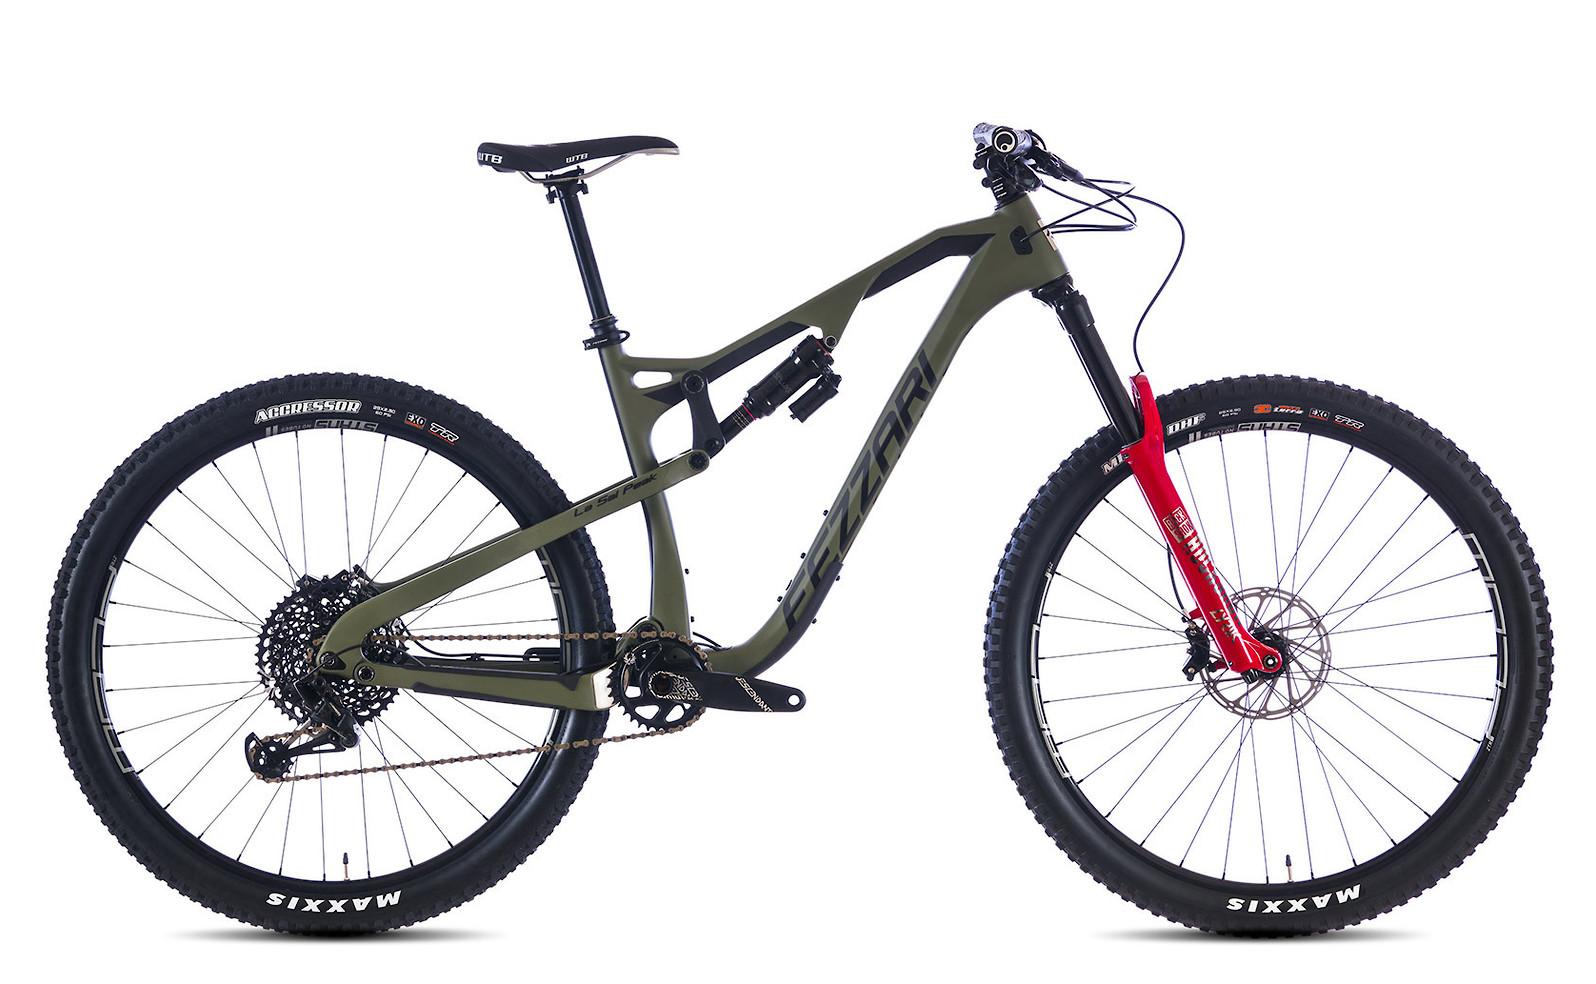 2019 Fezzari La Sal Peak Elite Bike